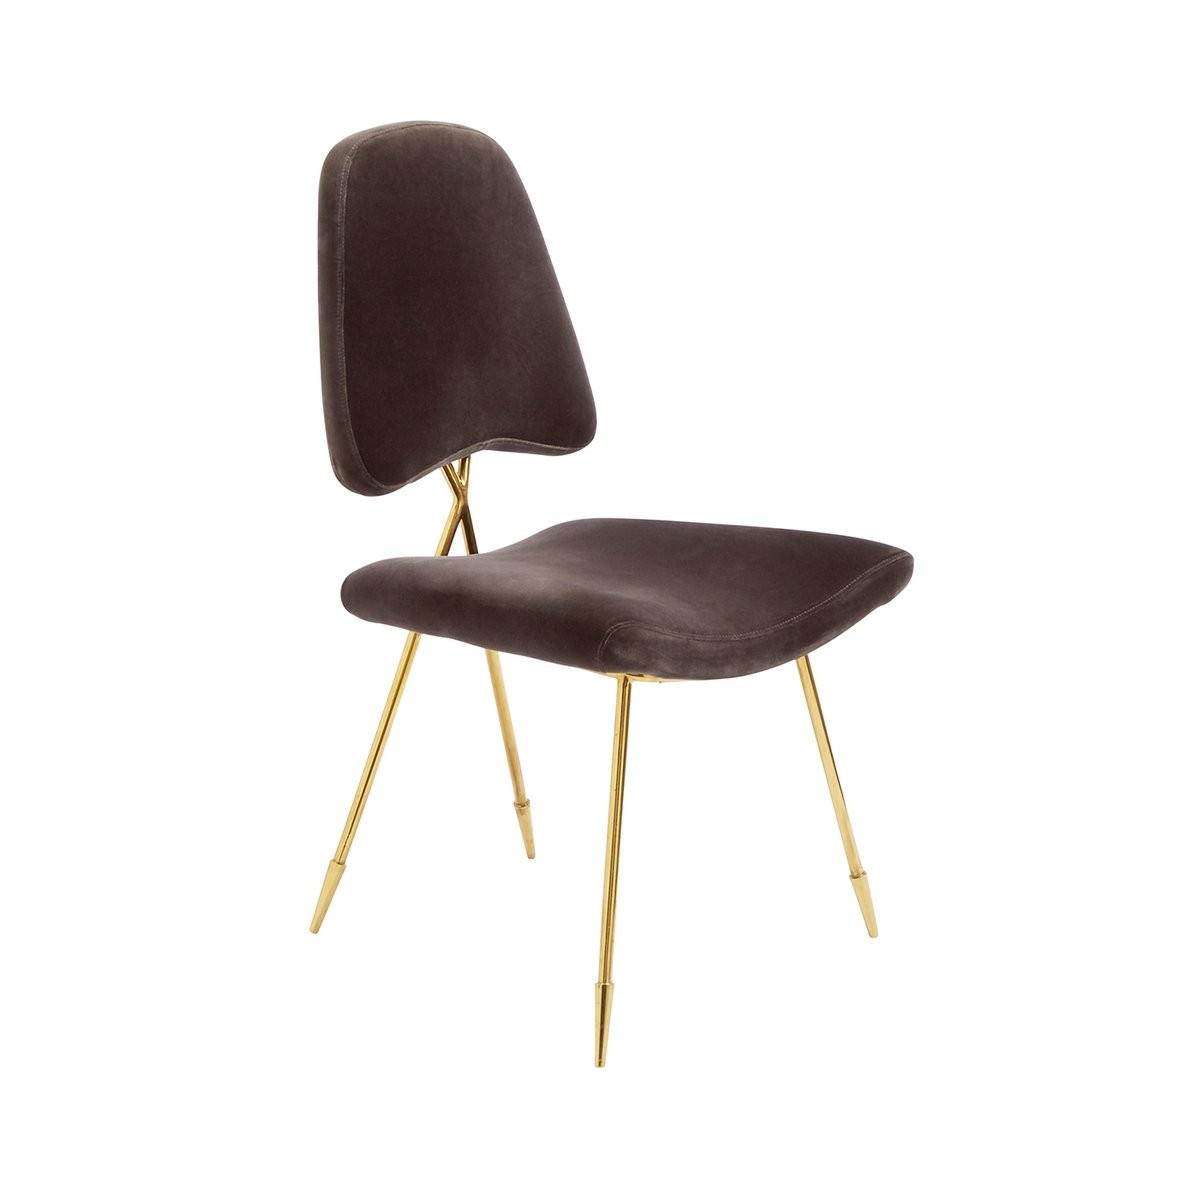 Jonathan Adler I Maxime Dining Chair I Rialto Charcoal